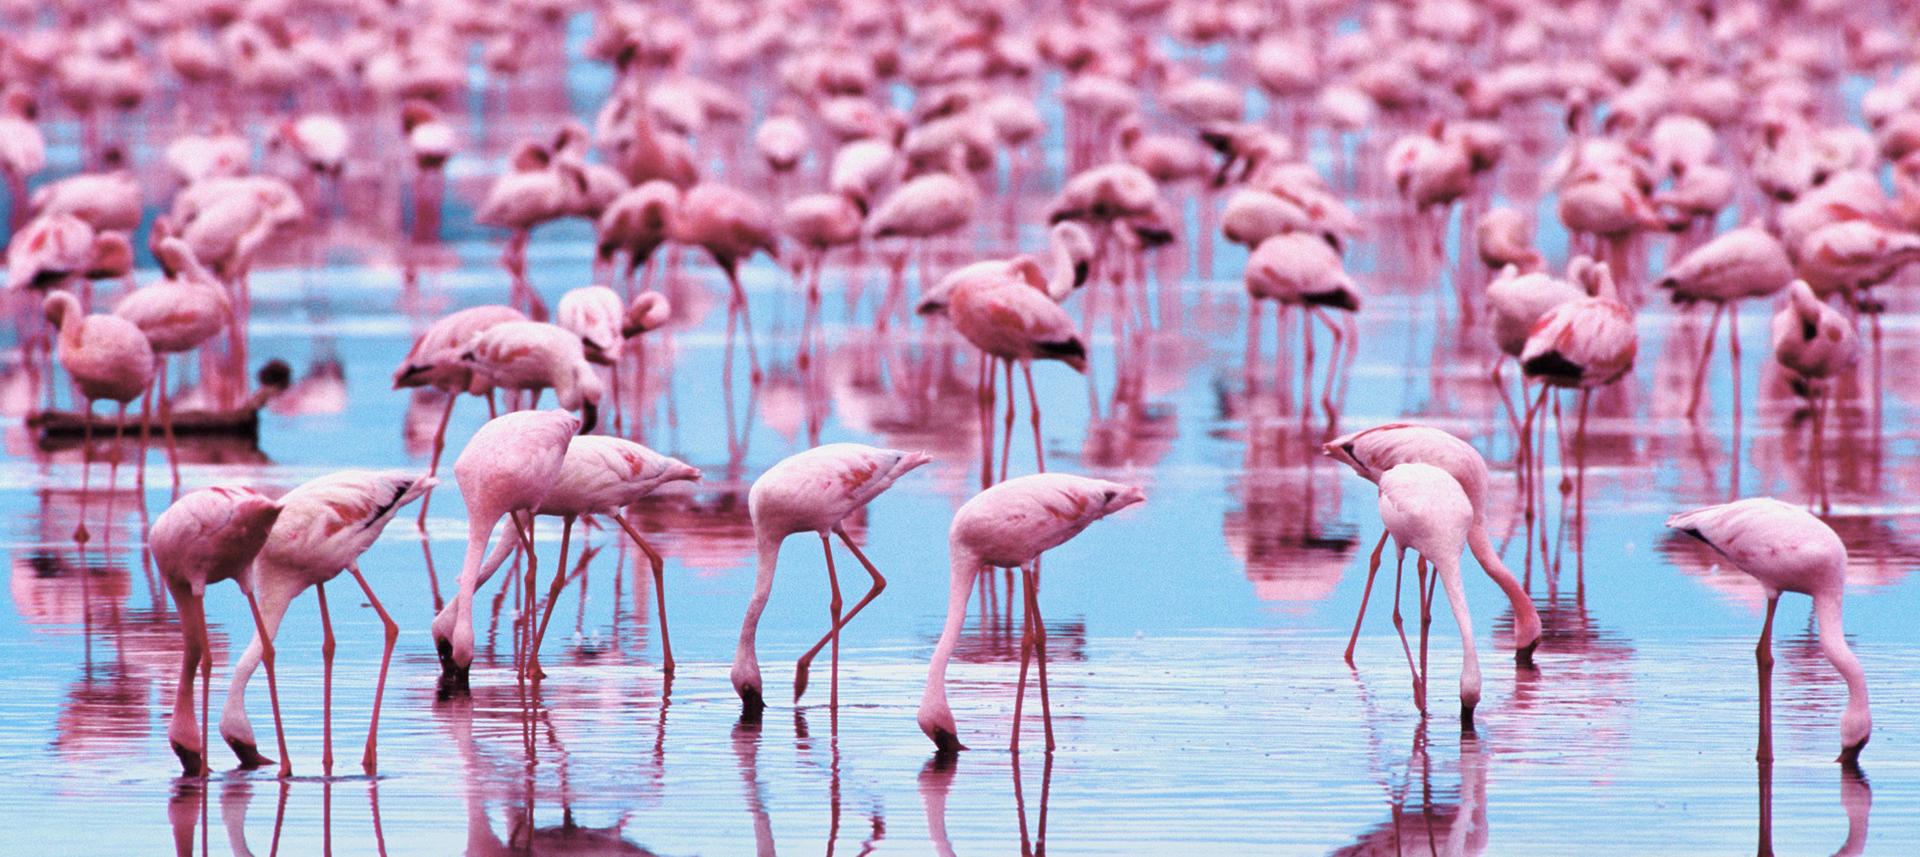 Background flamingo flamingos iphone wallpaper wallpaper - Animal Flamingo Wallpaper